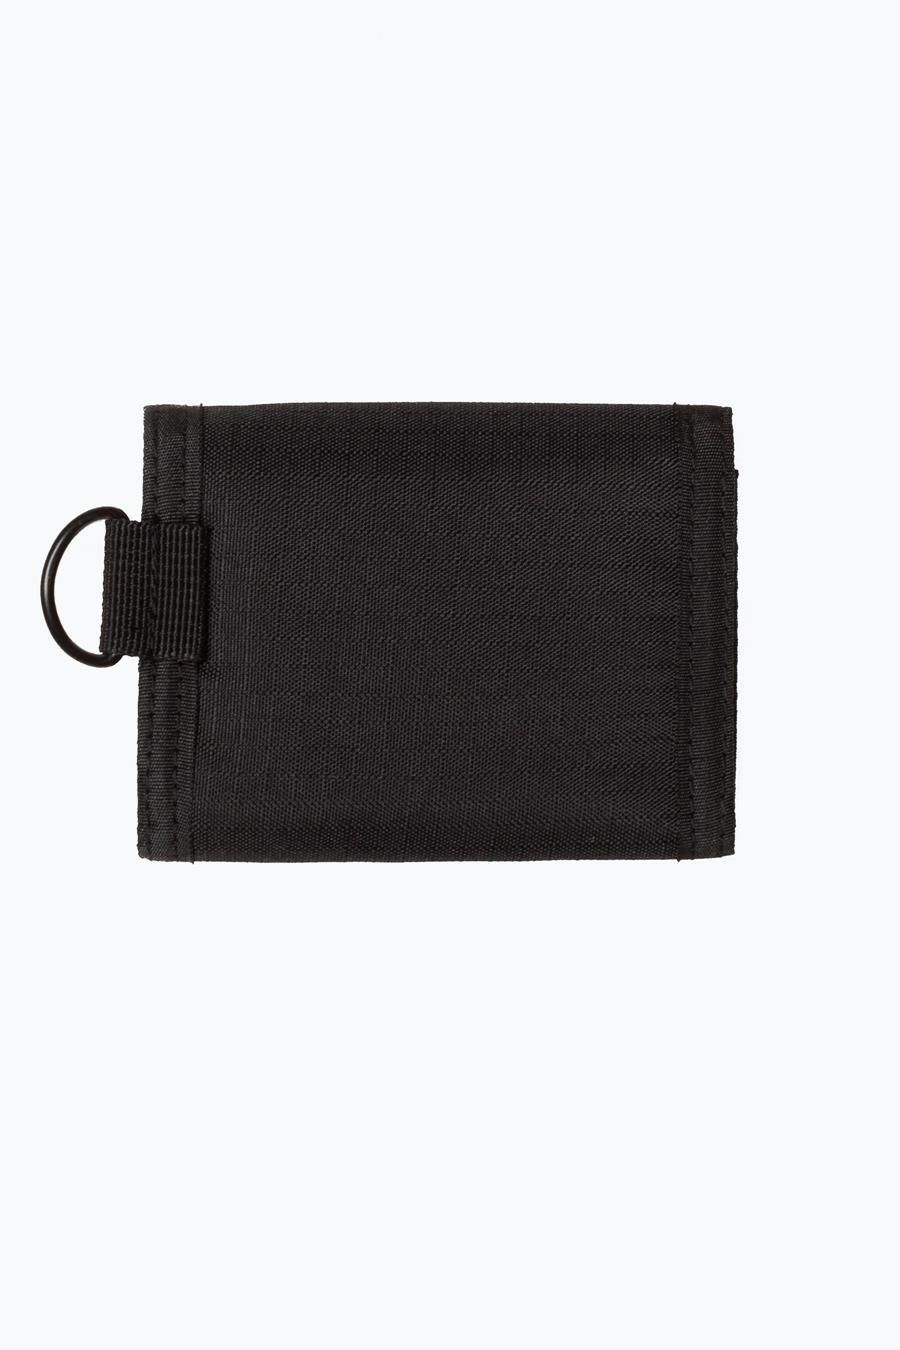 Hype Black Wallet